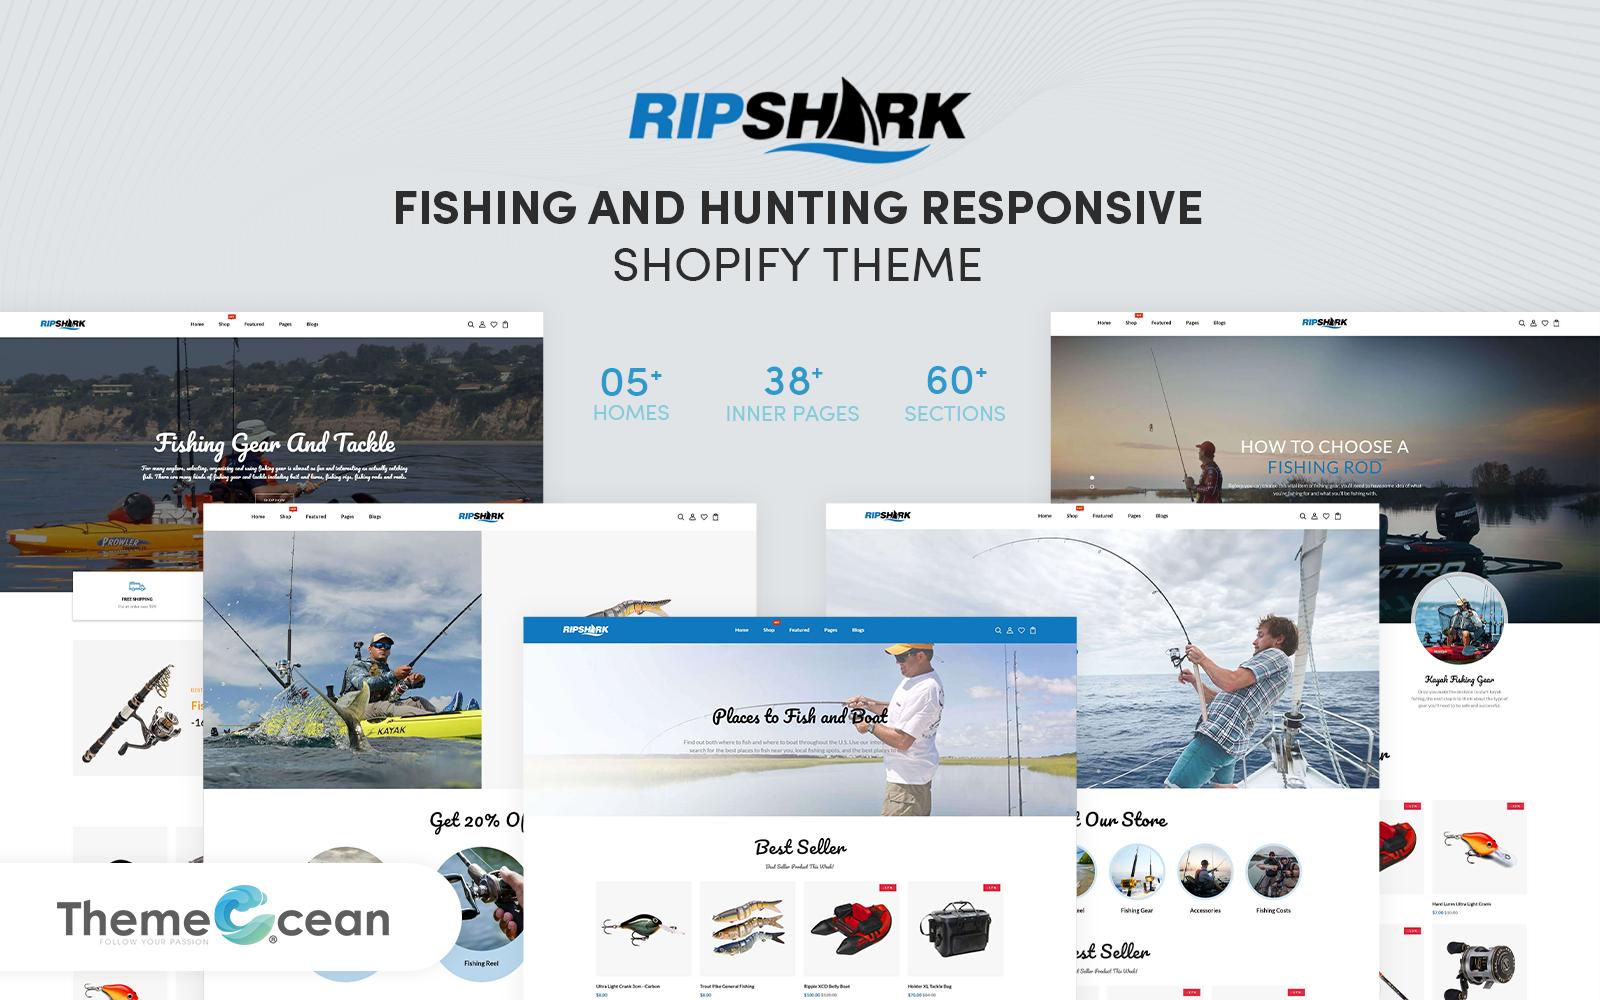 Ripshark - Fishing And Hunting Responsive Shopify Theme